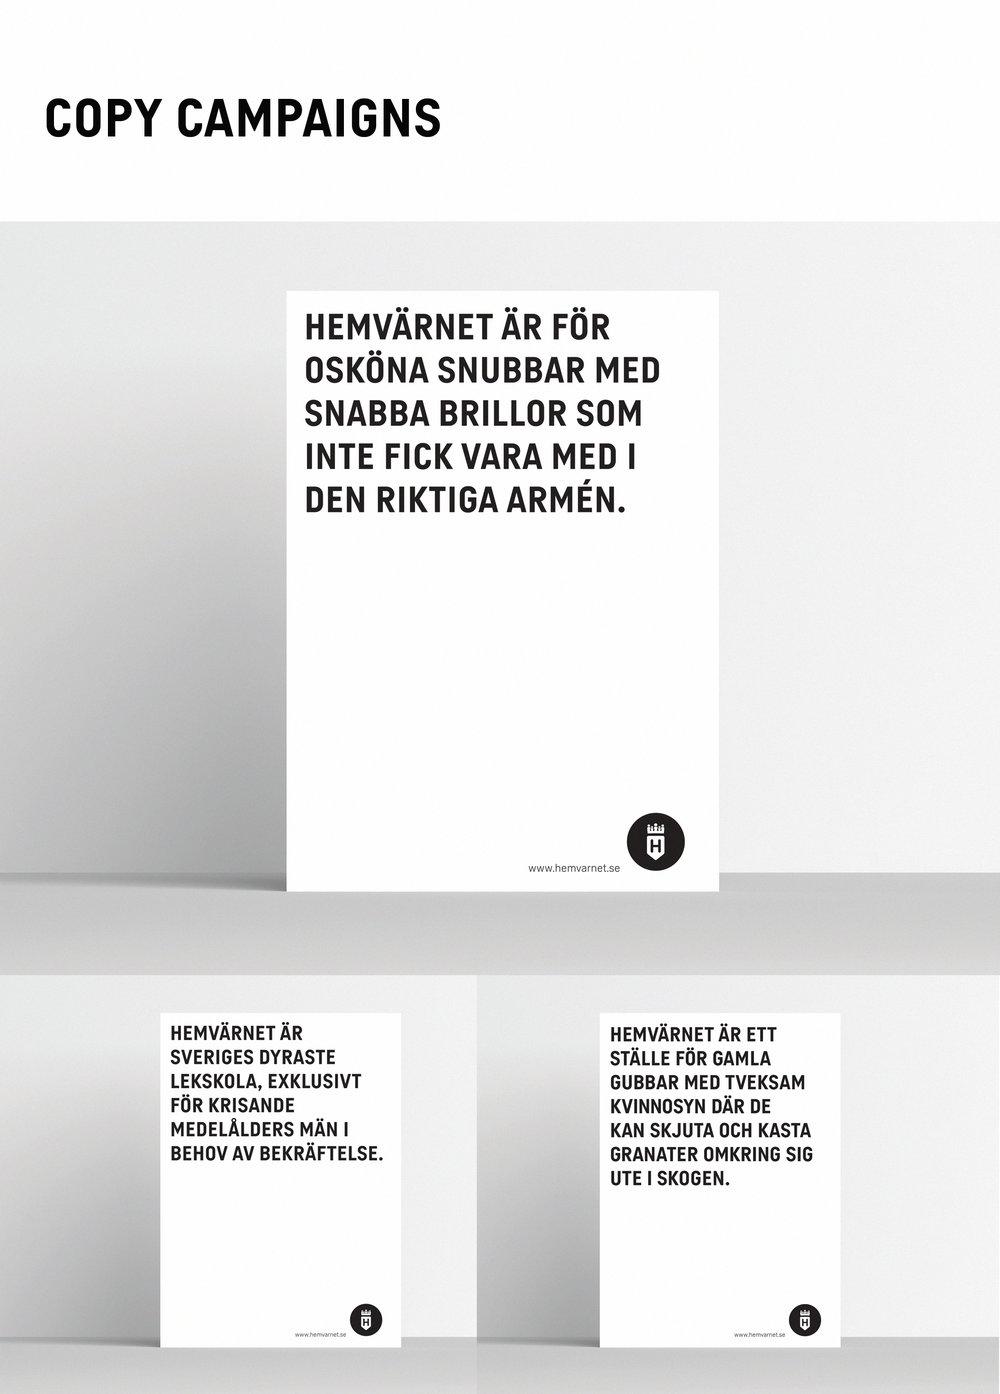 Hemvärnet-Nikiasimakidis_copy_campaigns.jpg